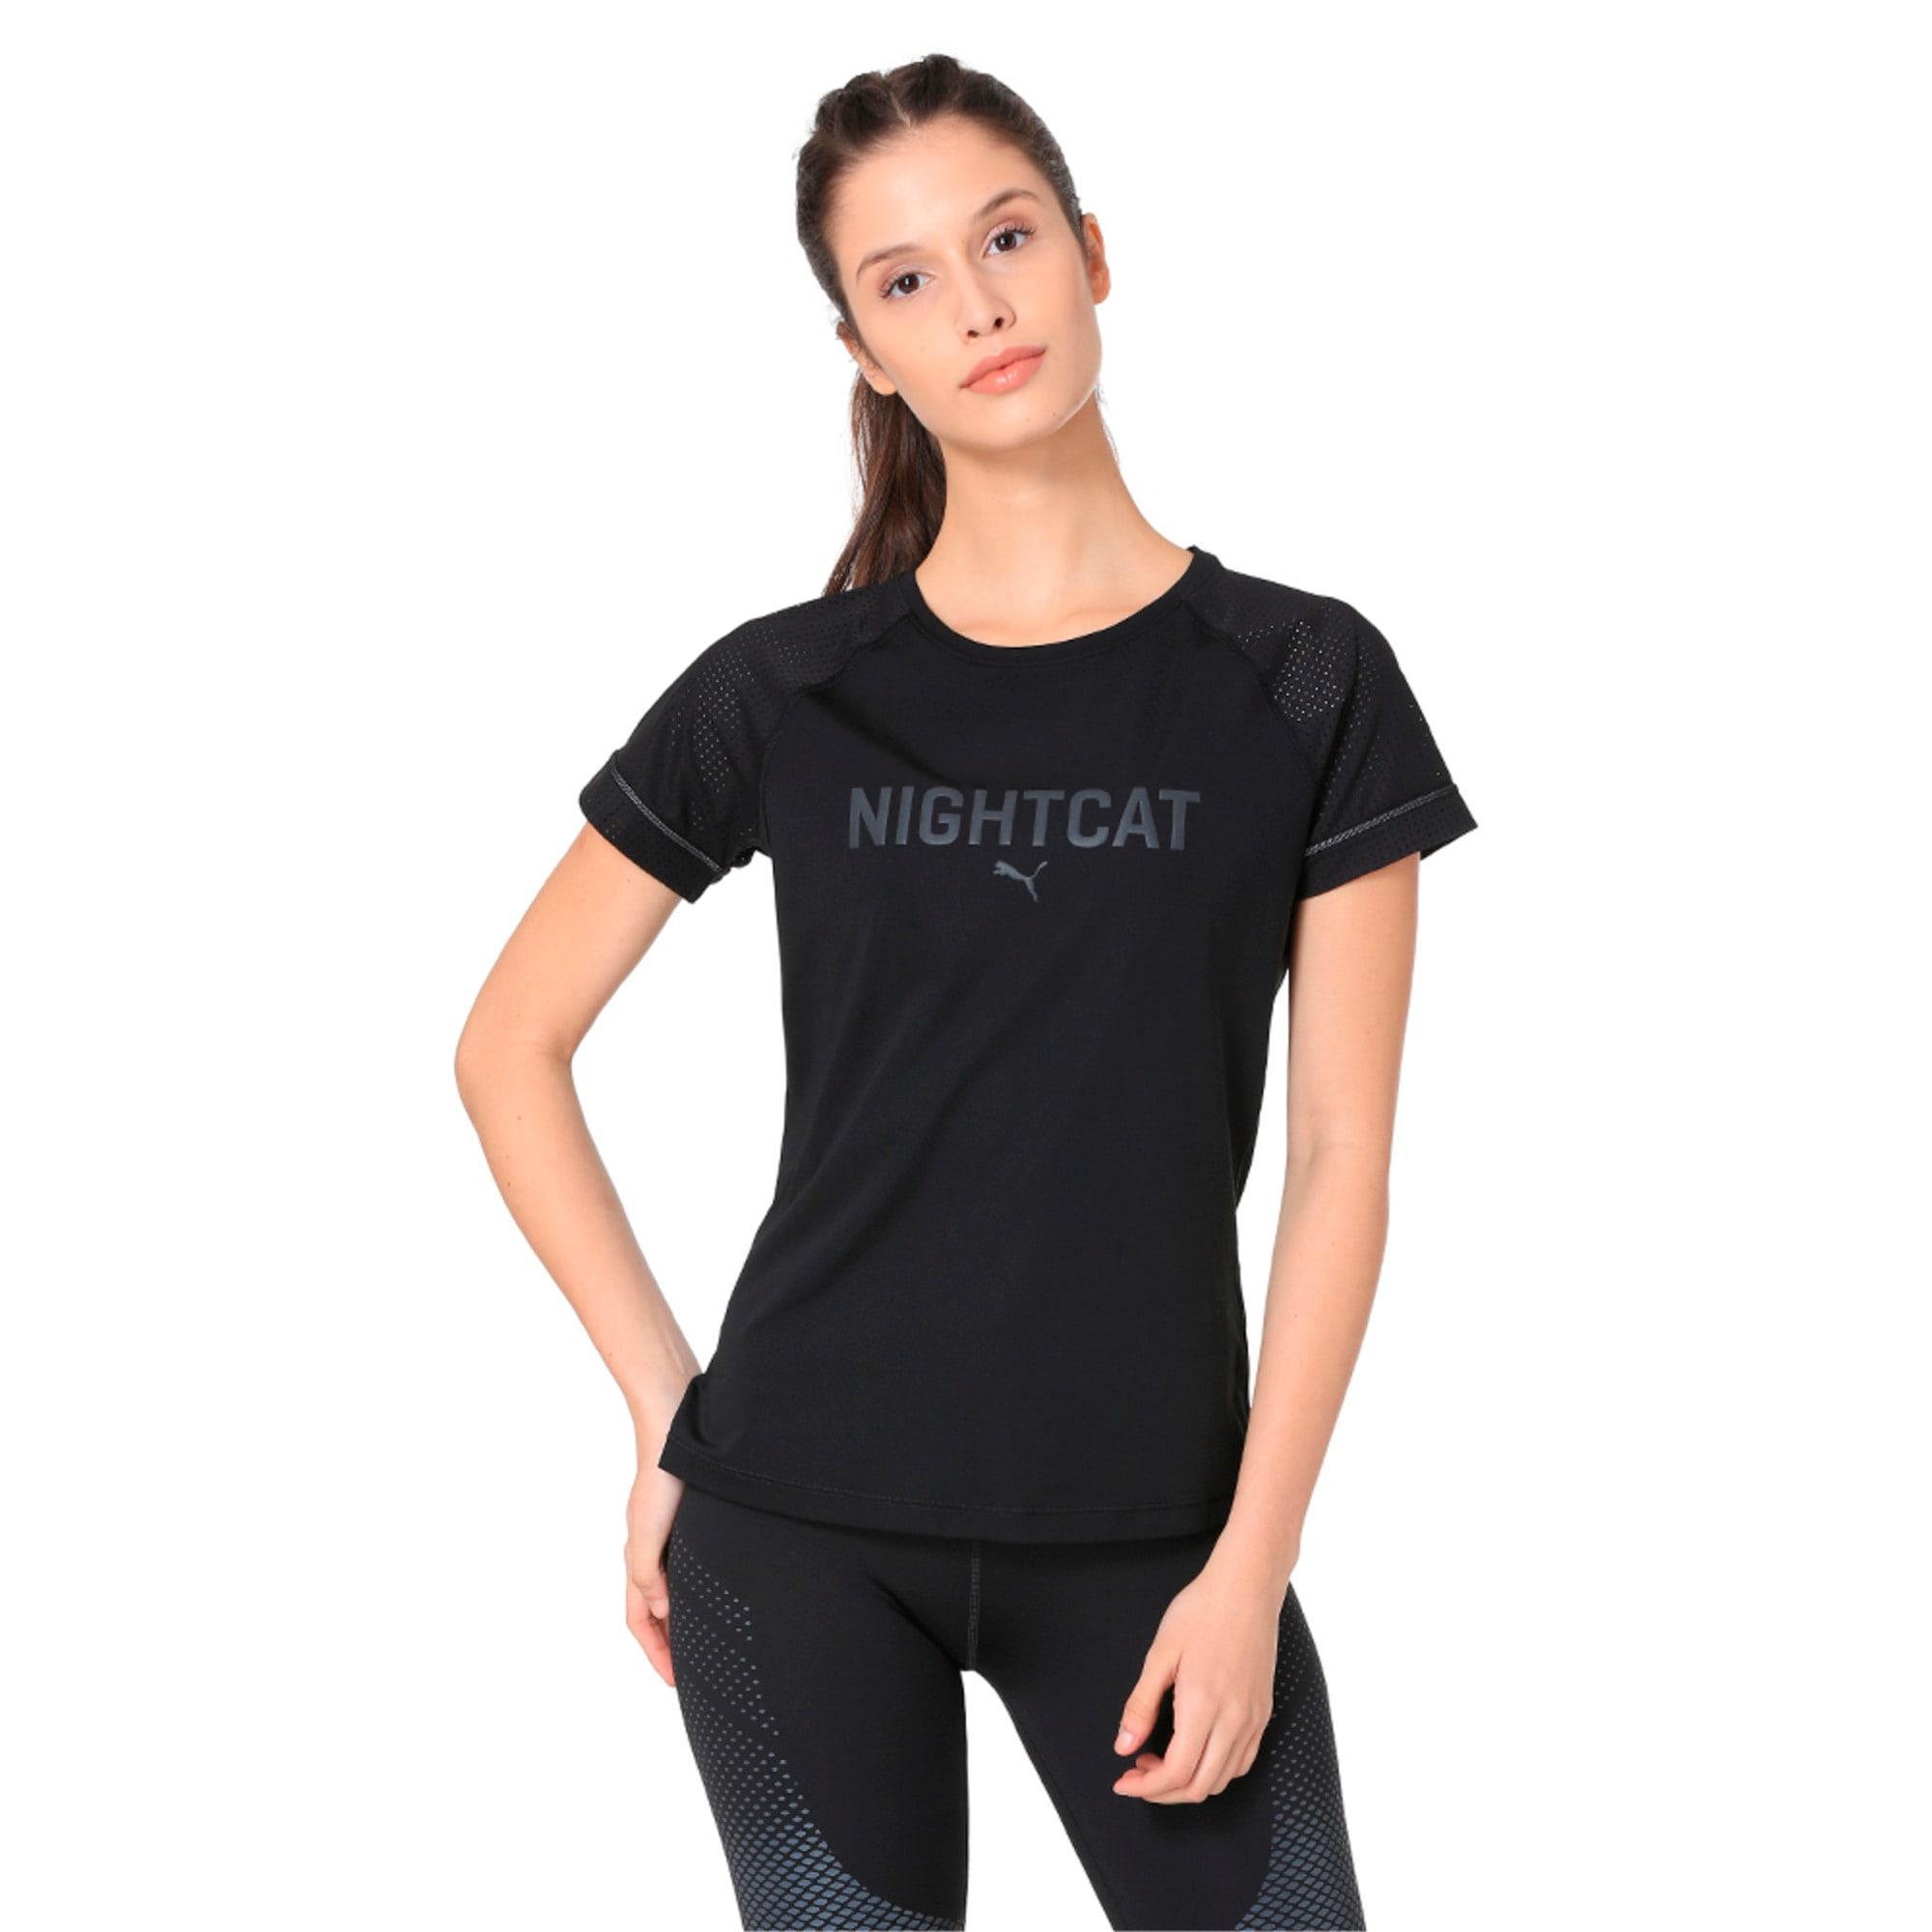 Thumbnail 1 of NightCat Women's Short Sleeve T-Shirt, Puma Black, medium-IND